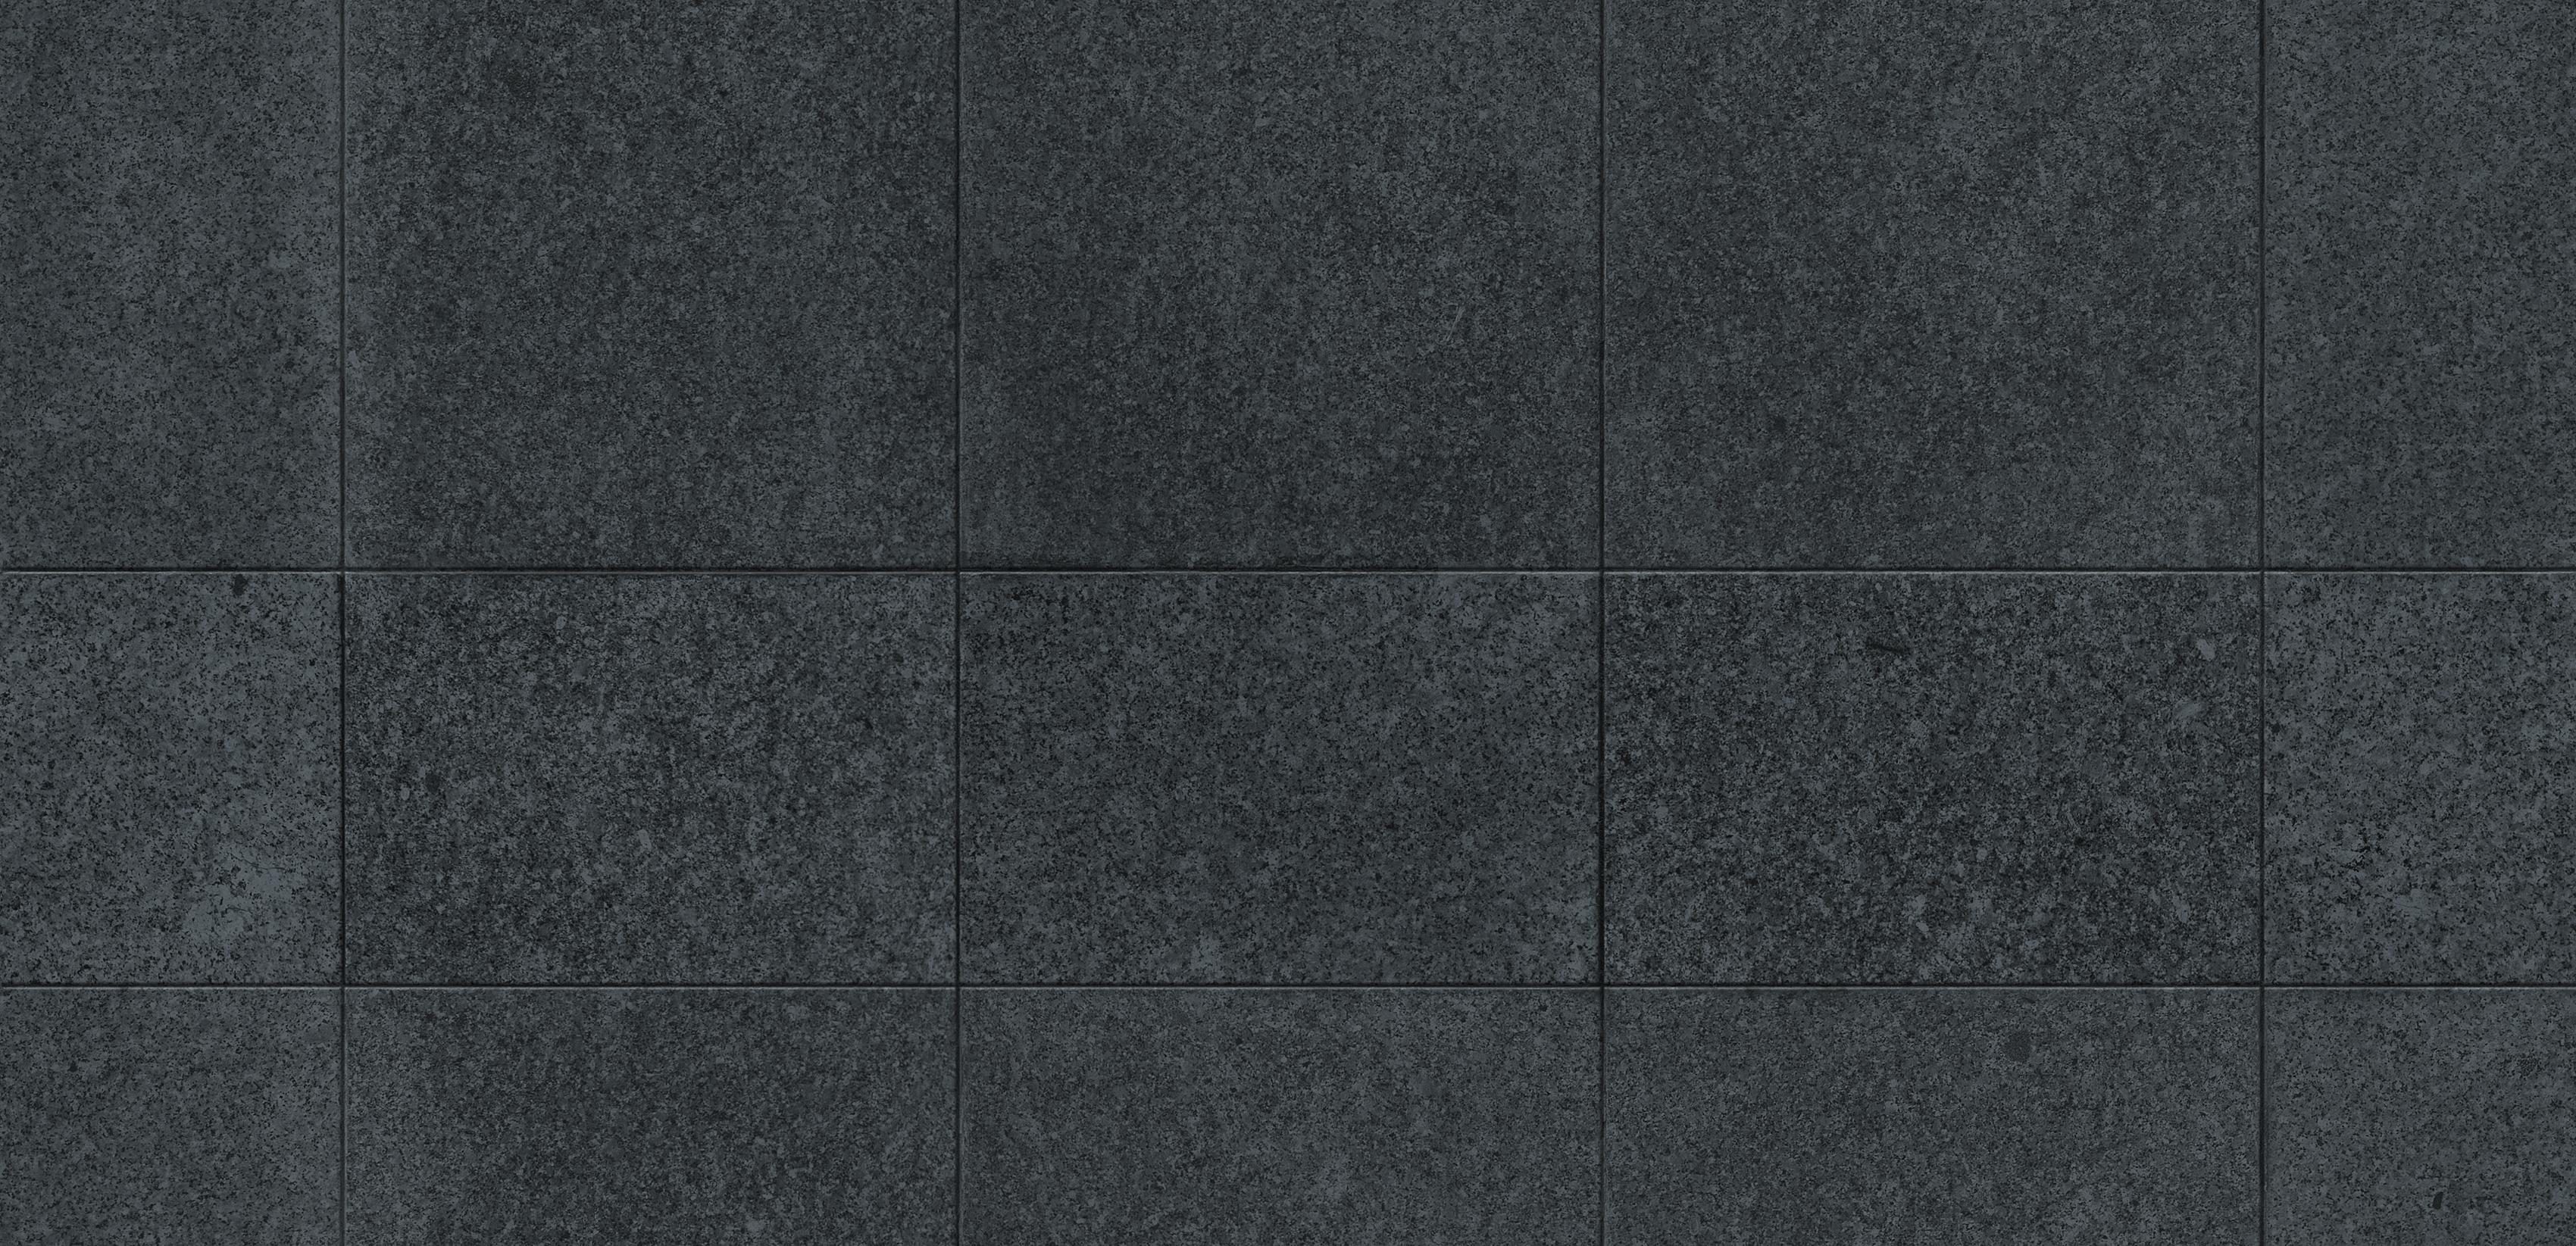 Free high resolution Black textures | Wild Textures